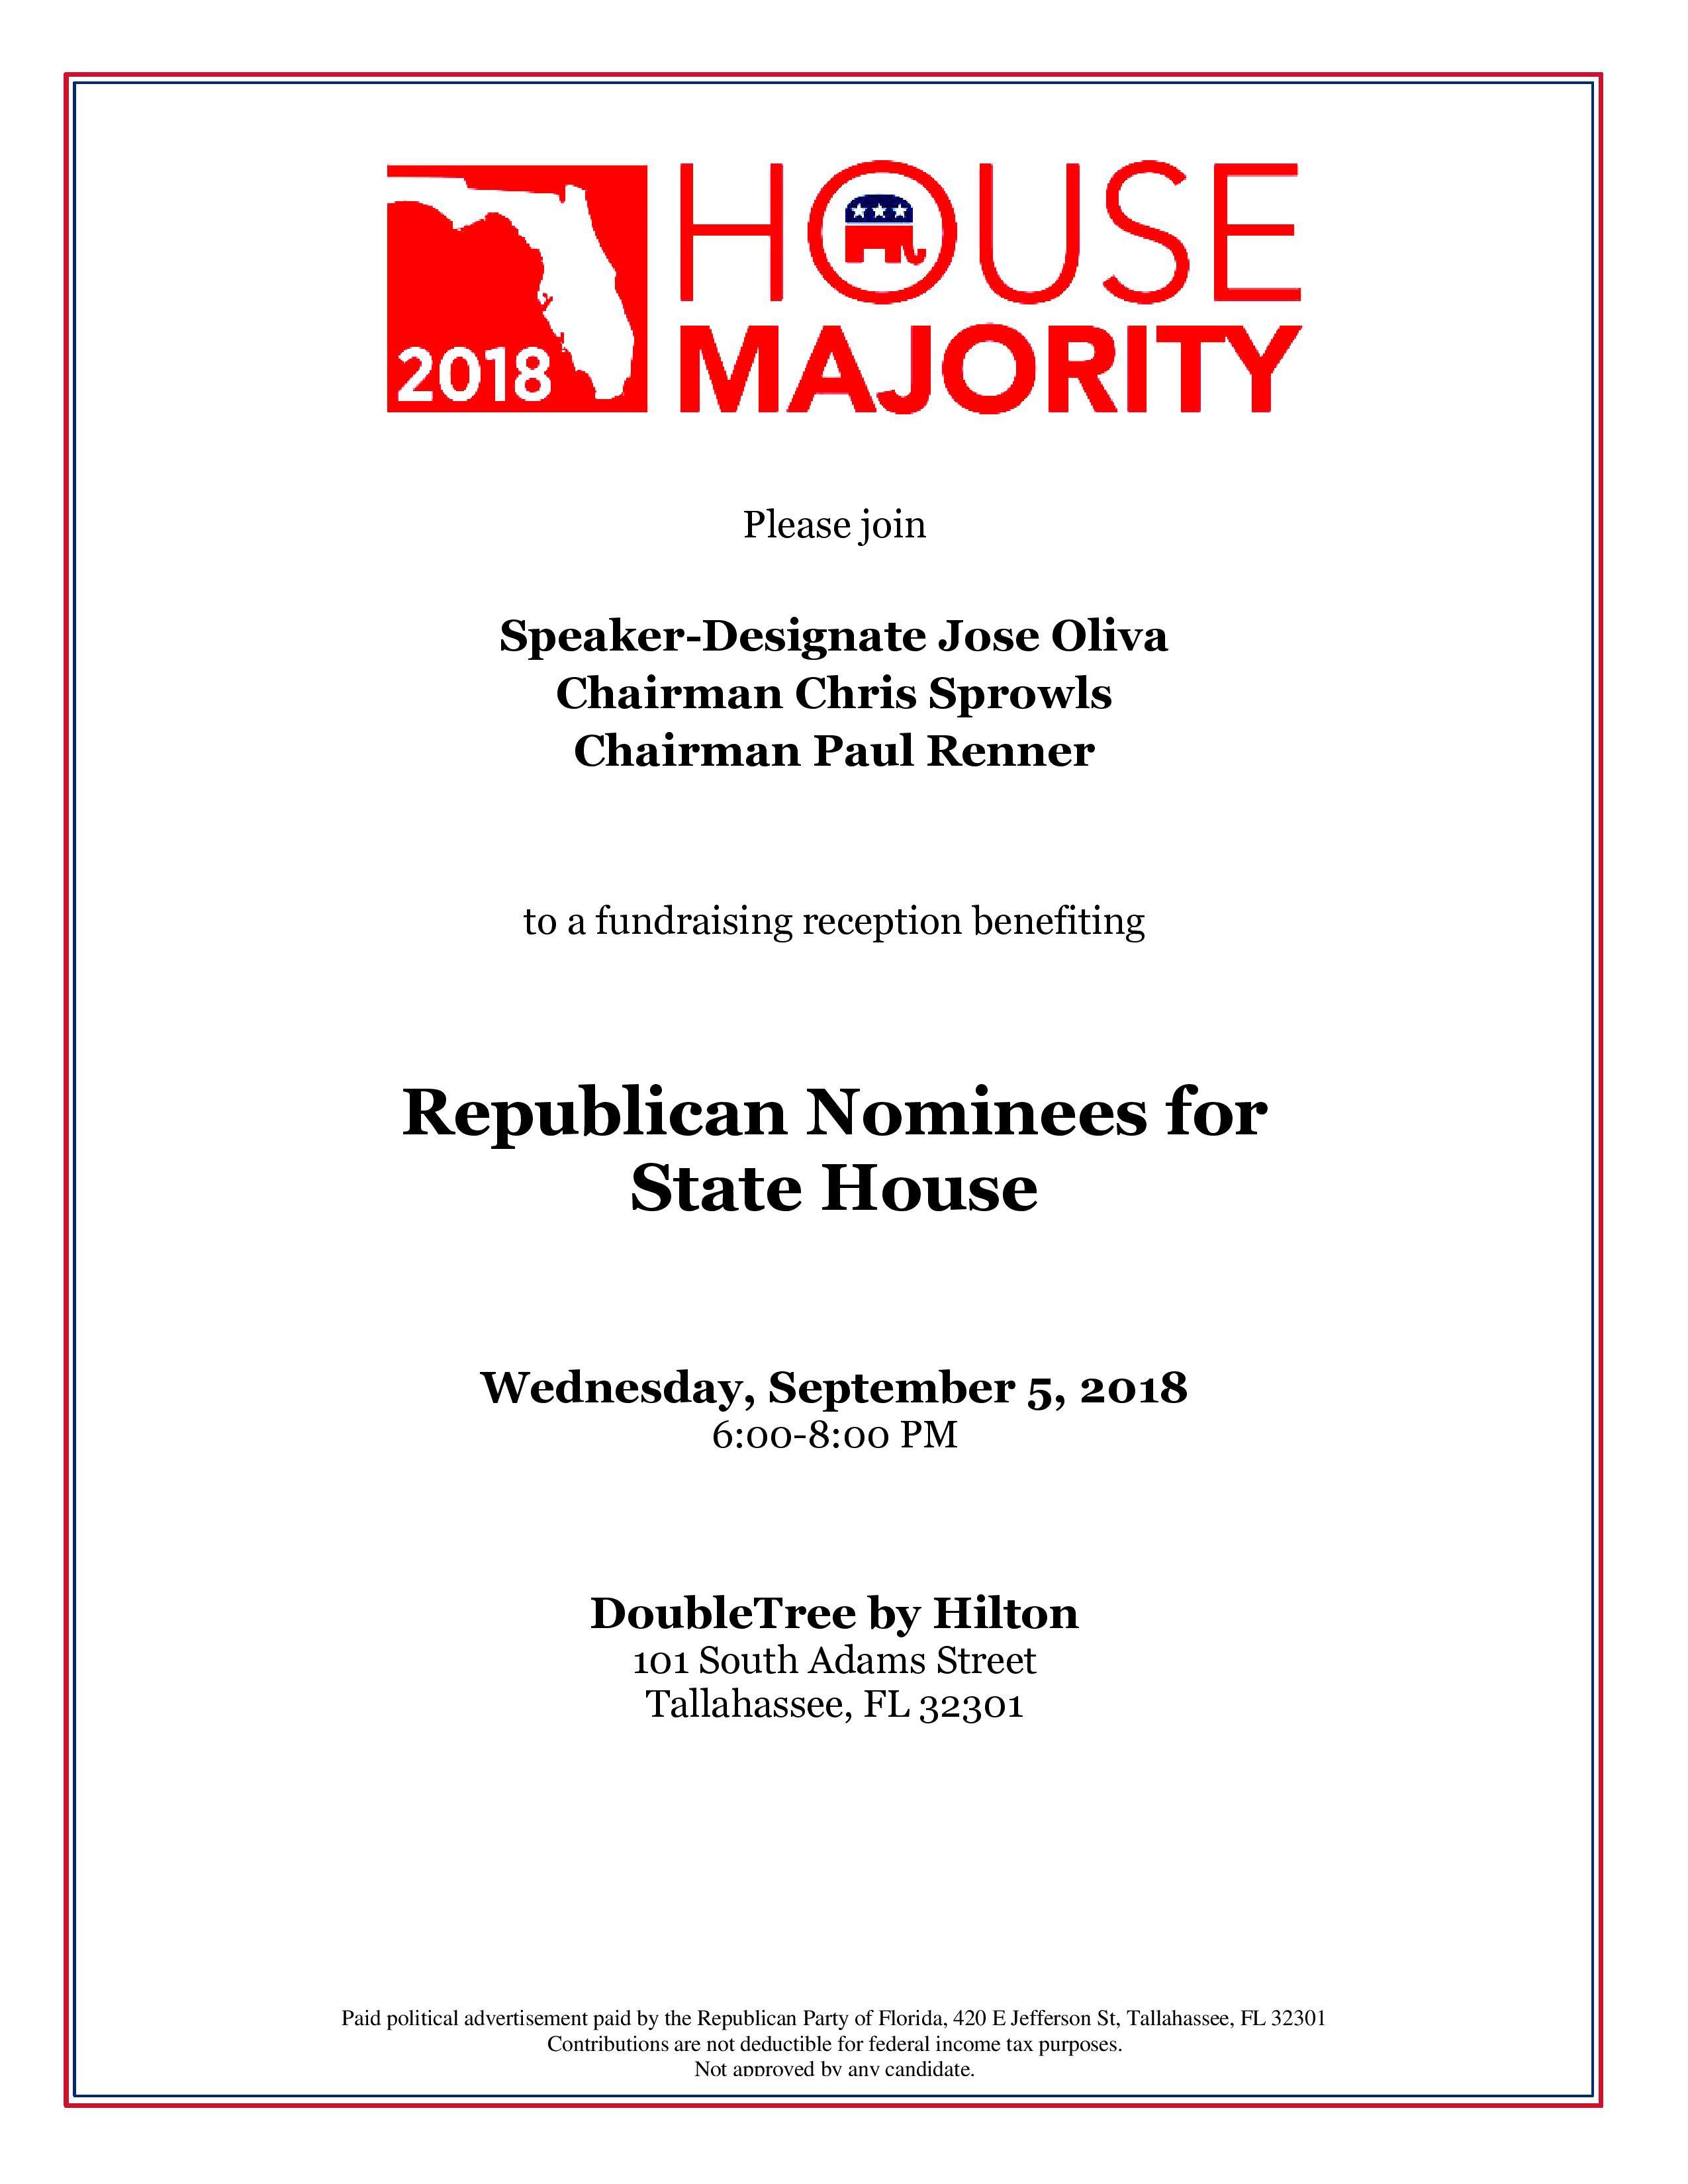 House Majority fundraiser 9.5.2018